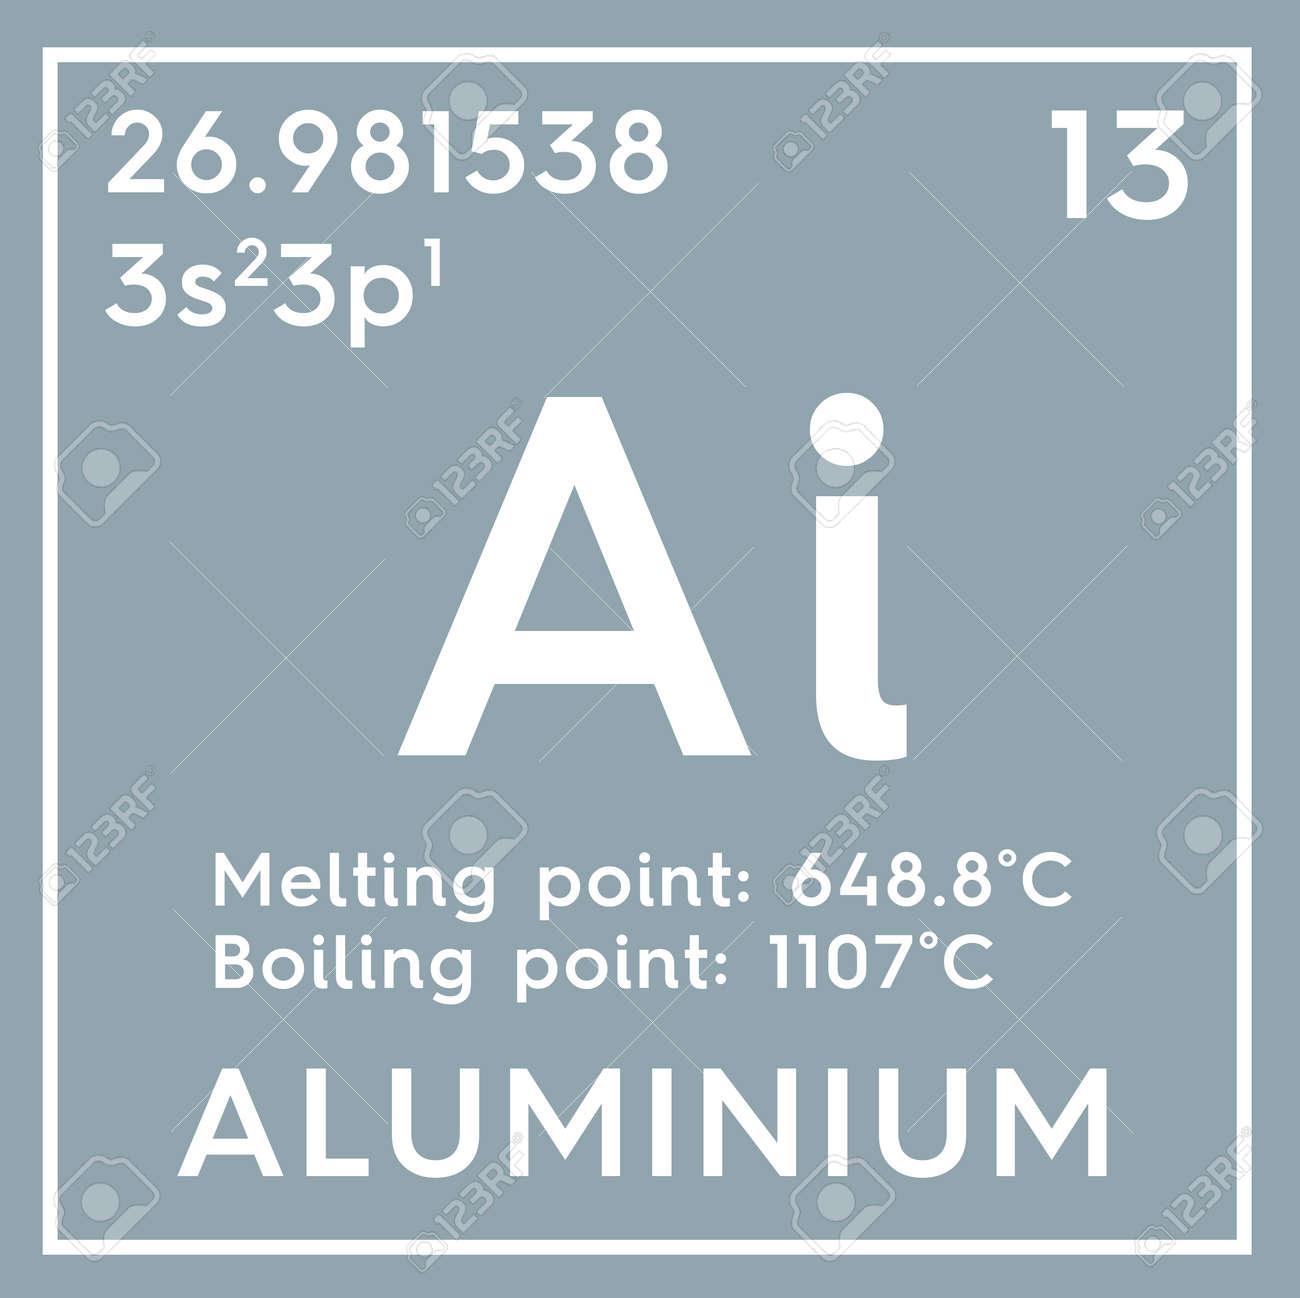 aluminum post transition metals chemical element of mendeleevs periodic table aluminum in - Periodic Table Aluminum